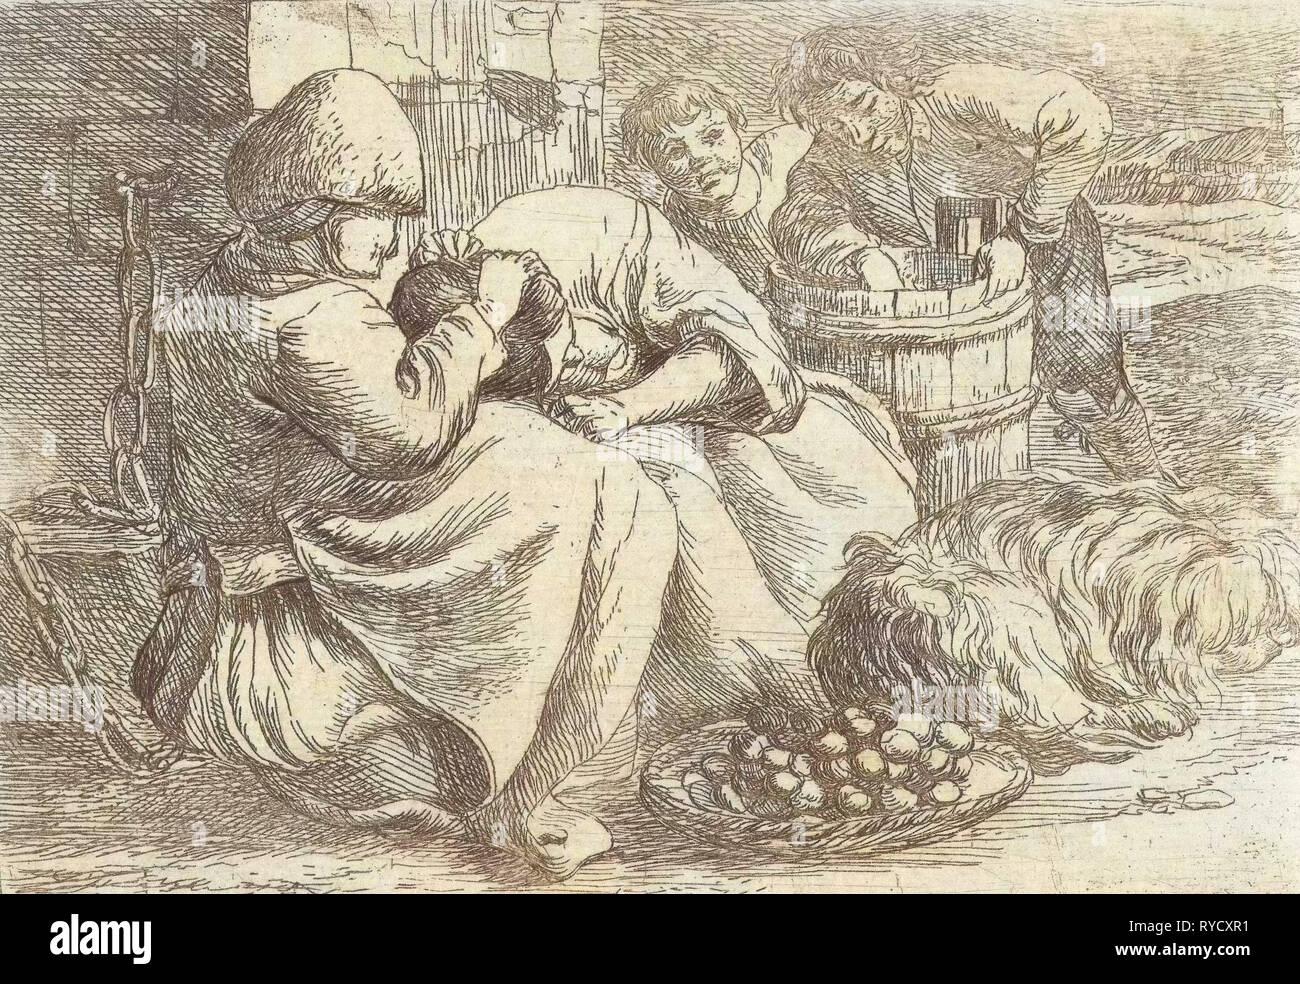 Old woman delouses a girl, Jan van Ossenbeeck, 1647 - 1674 Stock Photo